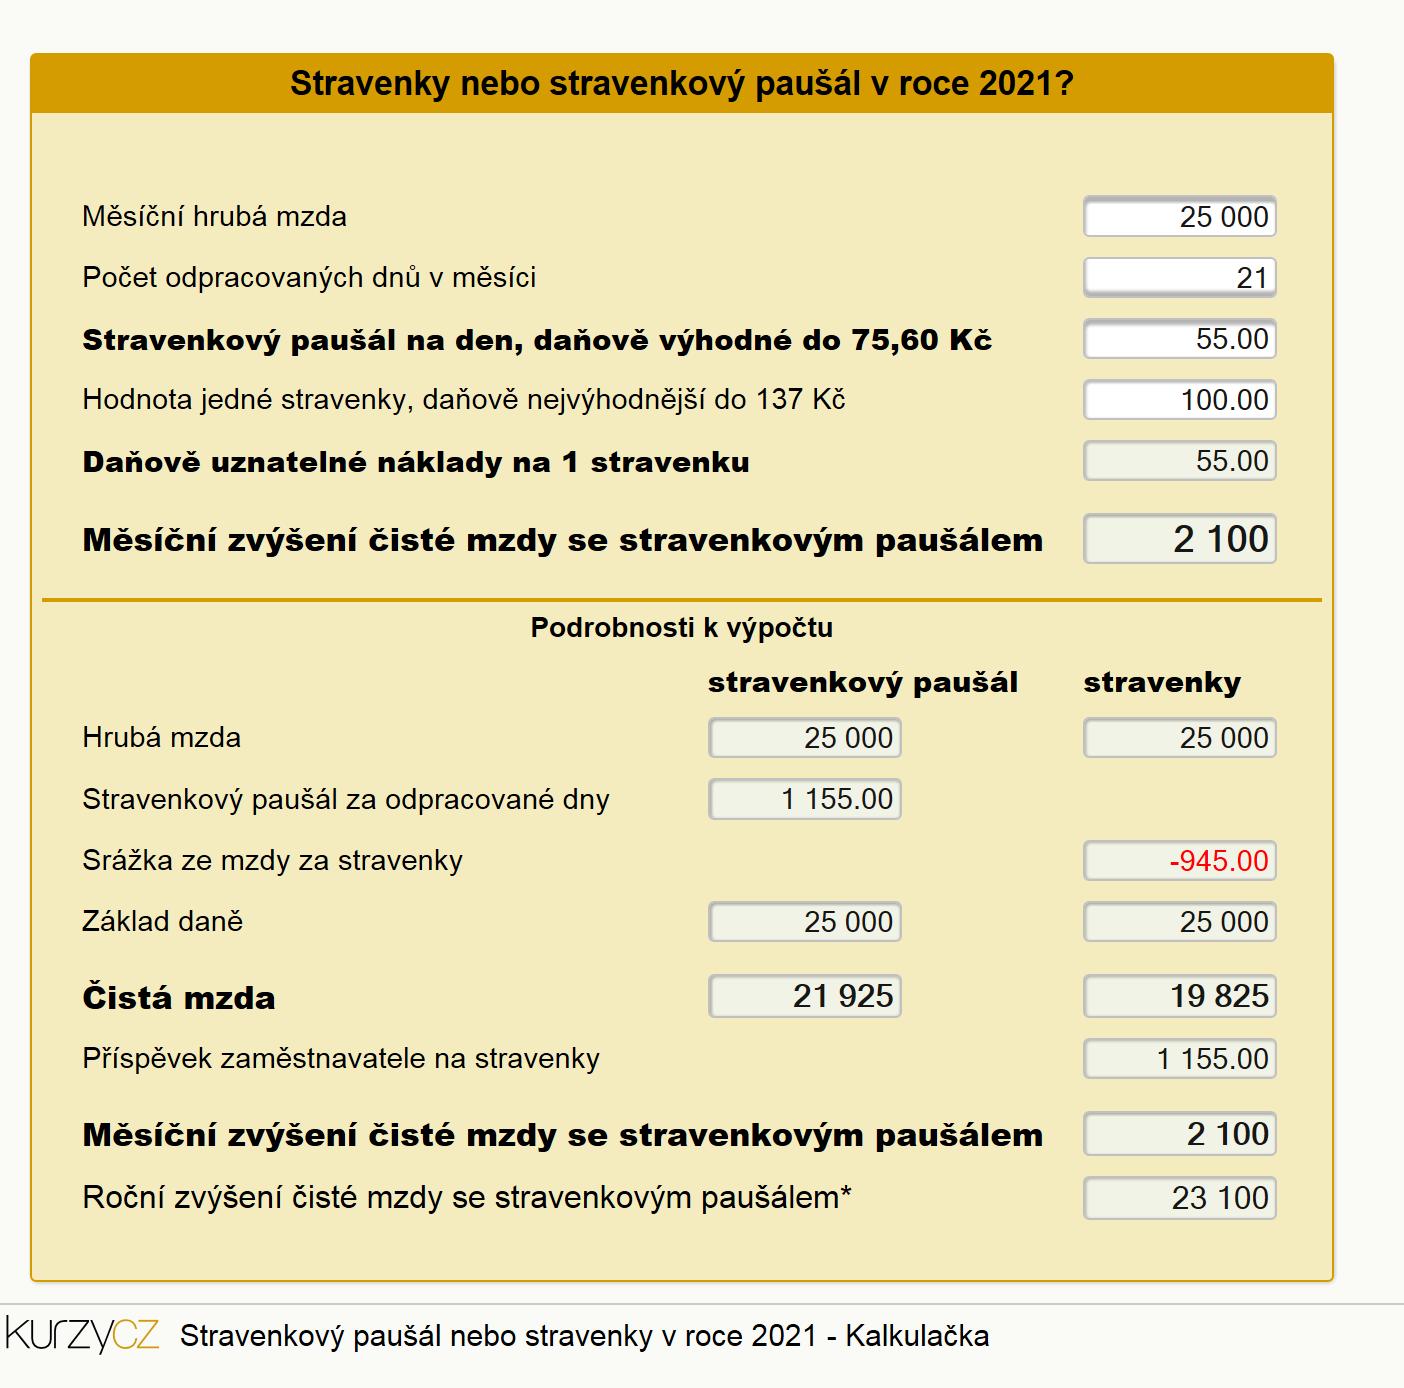 Stravenkový paušál nebo stravenky - Kalkulačka pro rok 2021